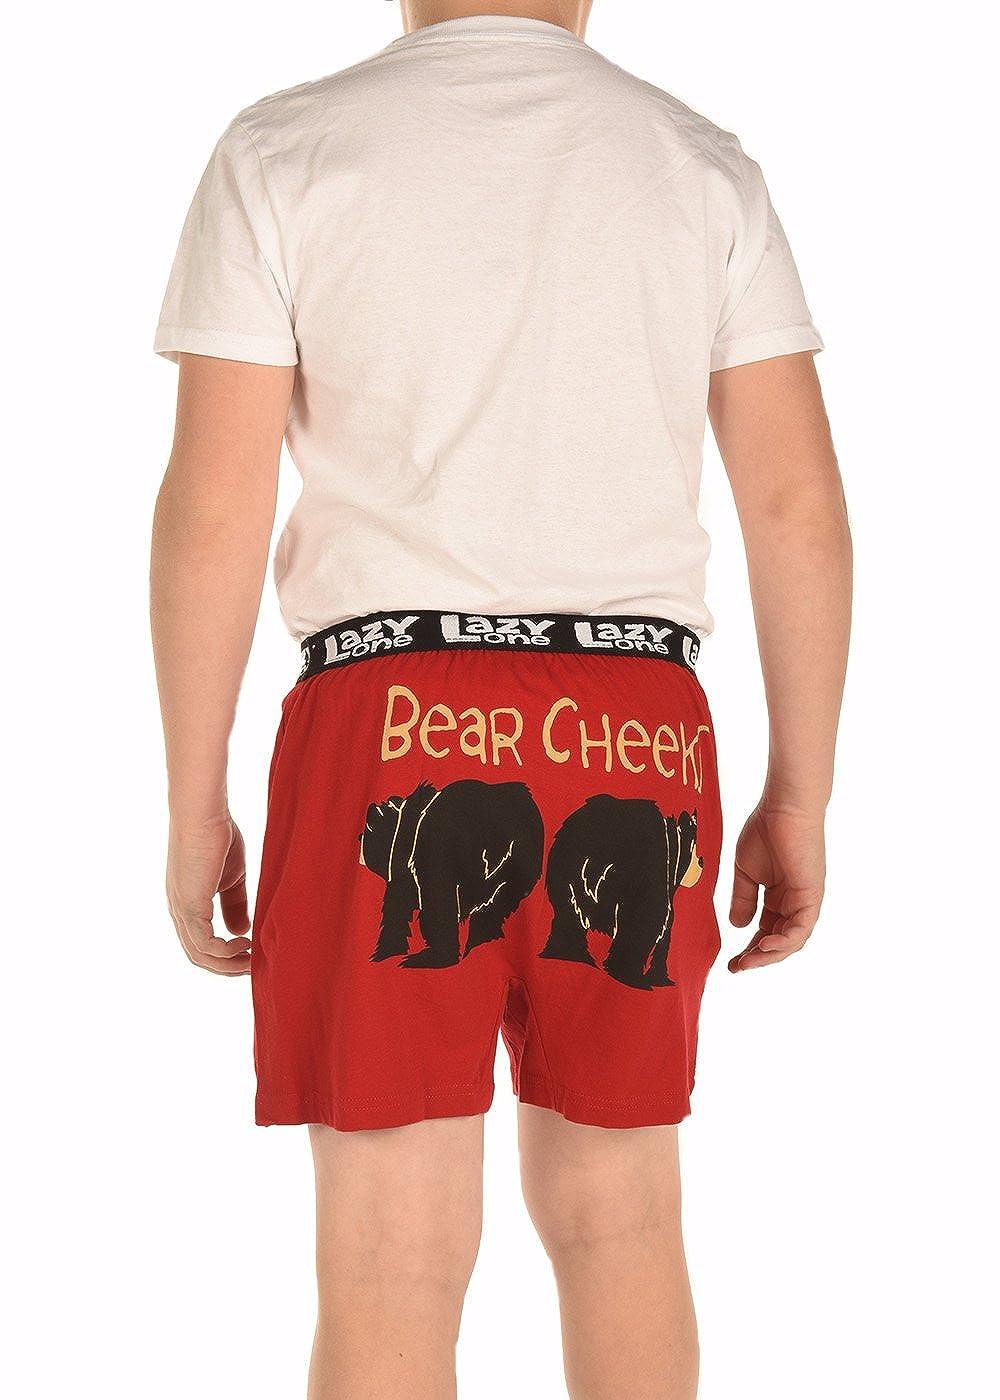 Boys Funny Animal by LazyOne Kids Comical Underwear